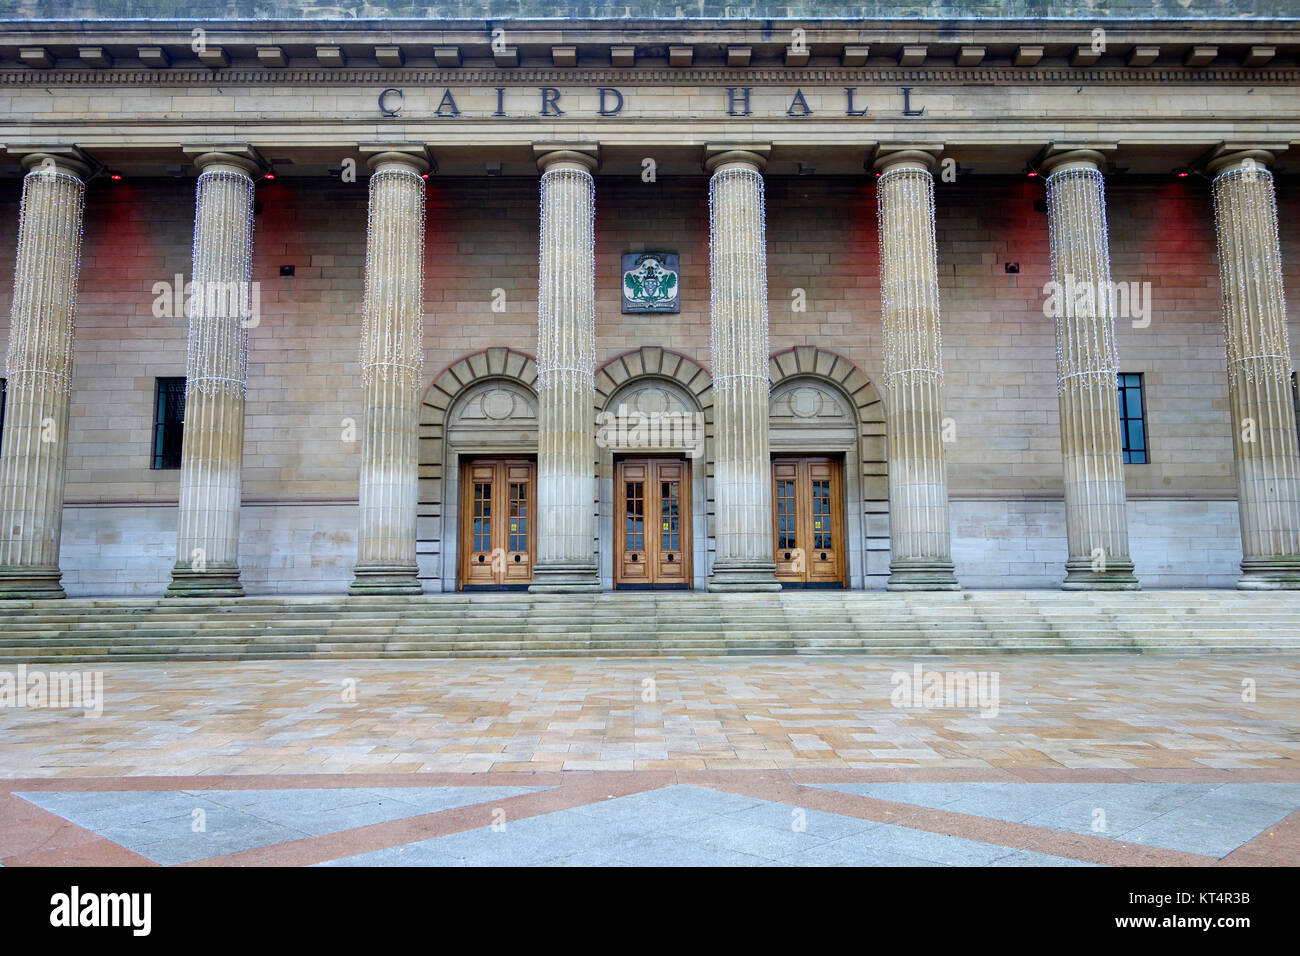 Caird Hall, Dundee, Scotland. - Stock Image